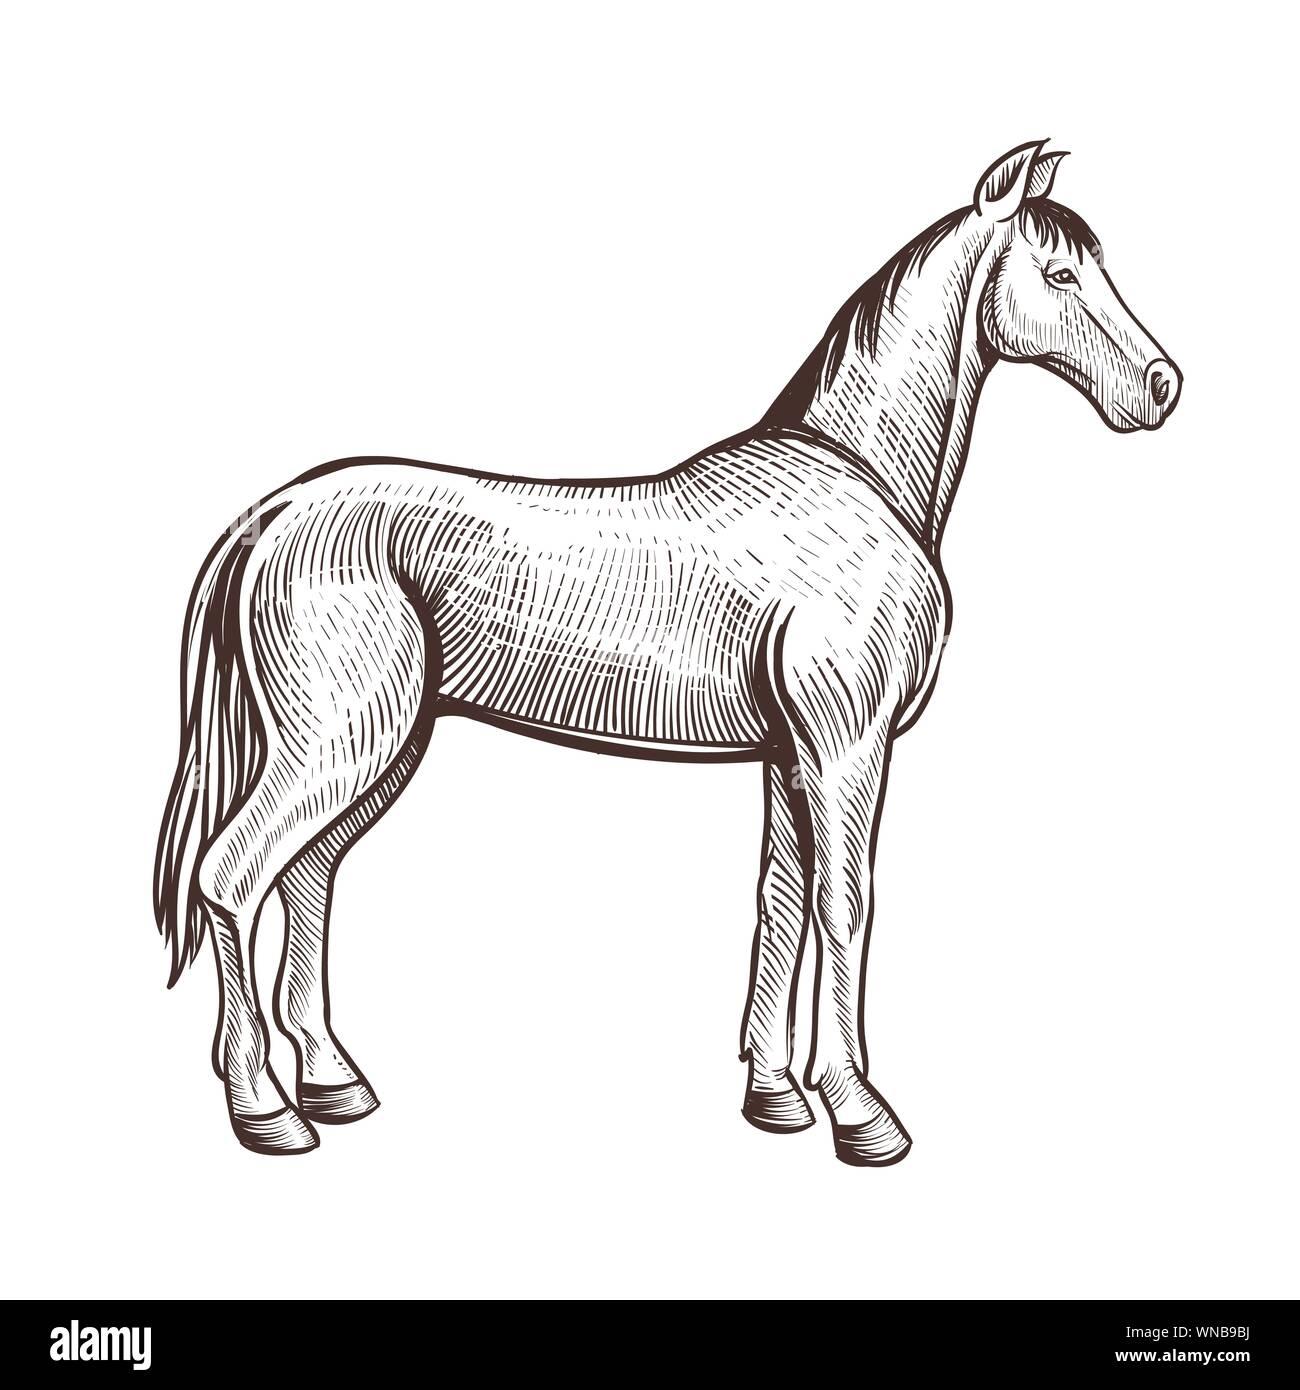 Horse Handdrawn Artwork Horse Animal Sketch For Horseback Riding Equestrian Sport Or Other Design Vector Illustration Isolated On White Stock Vector Image Art Alamy